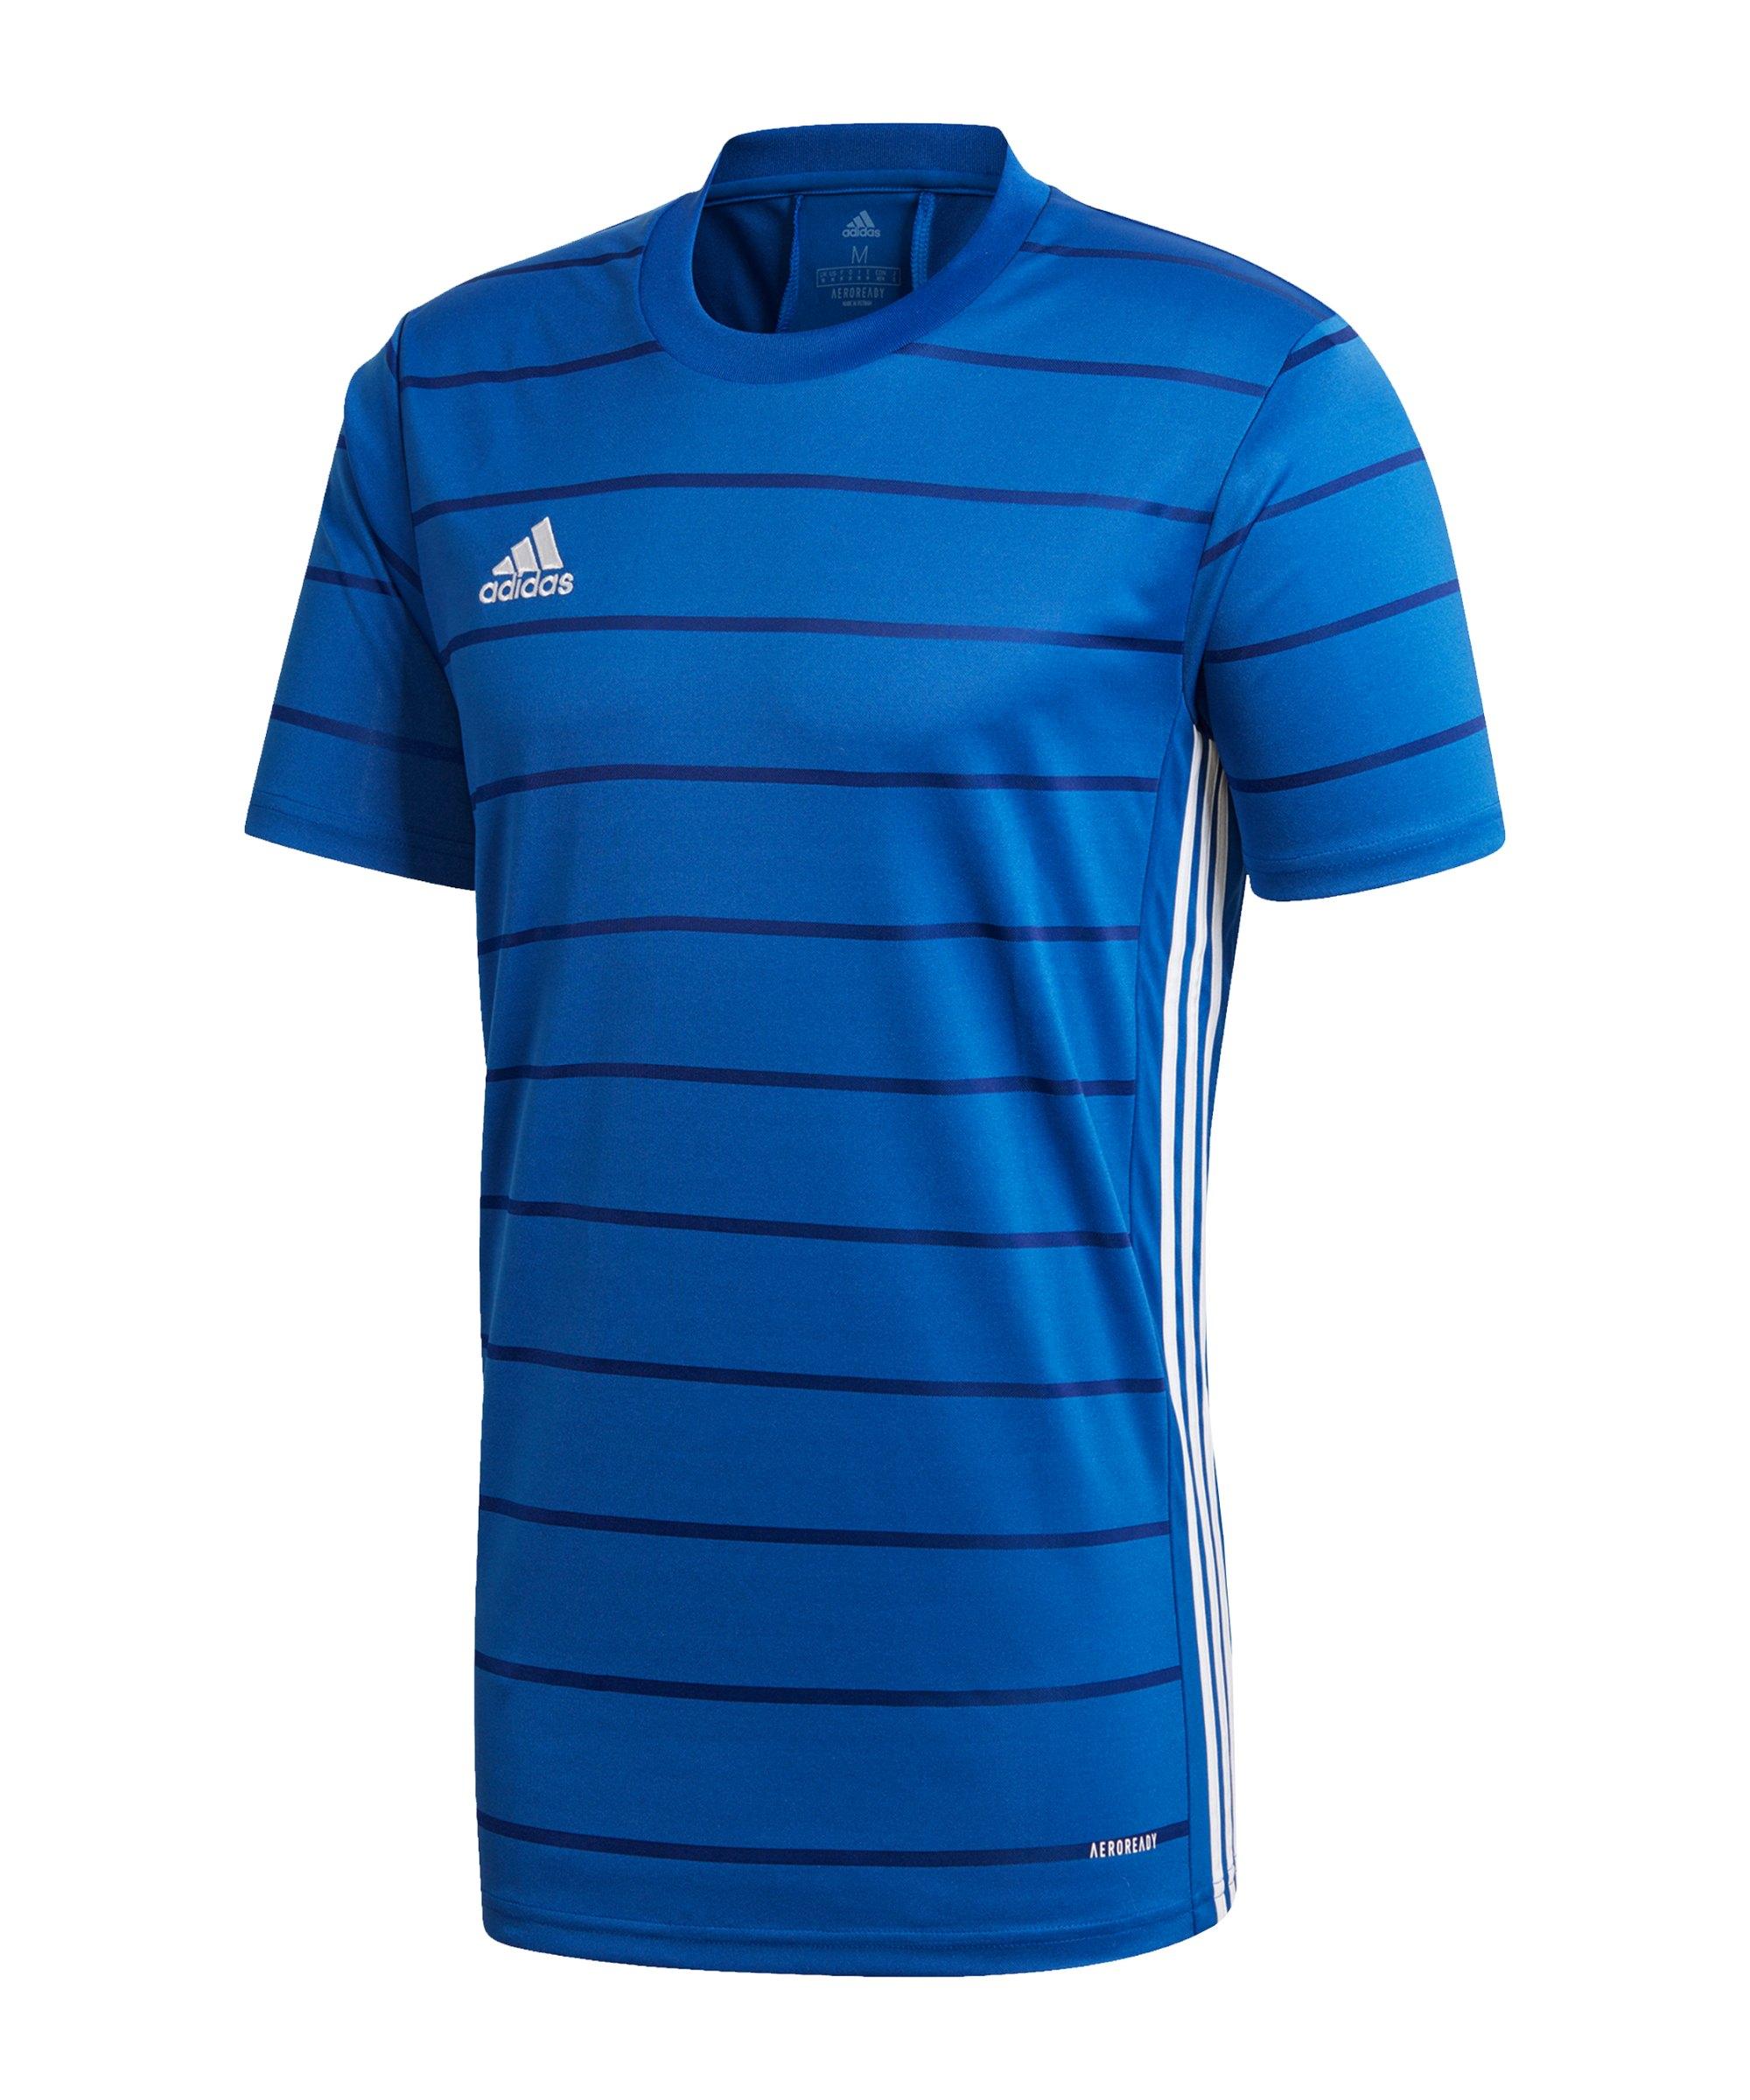 adidas Campeon 21 Trikot kurzarm Blau - blau